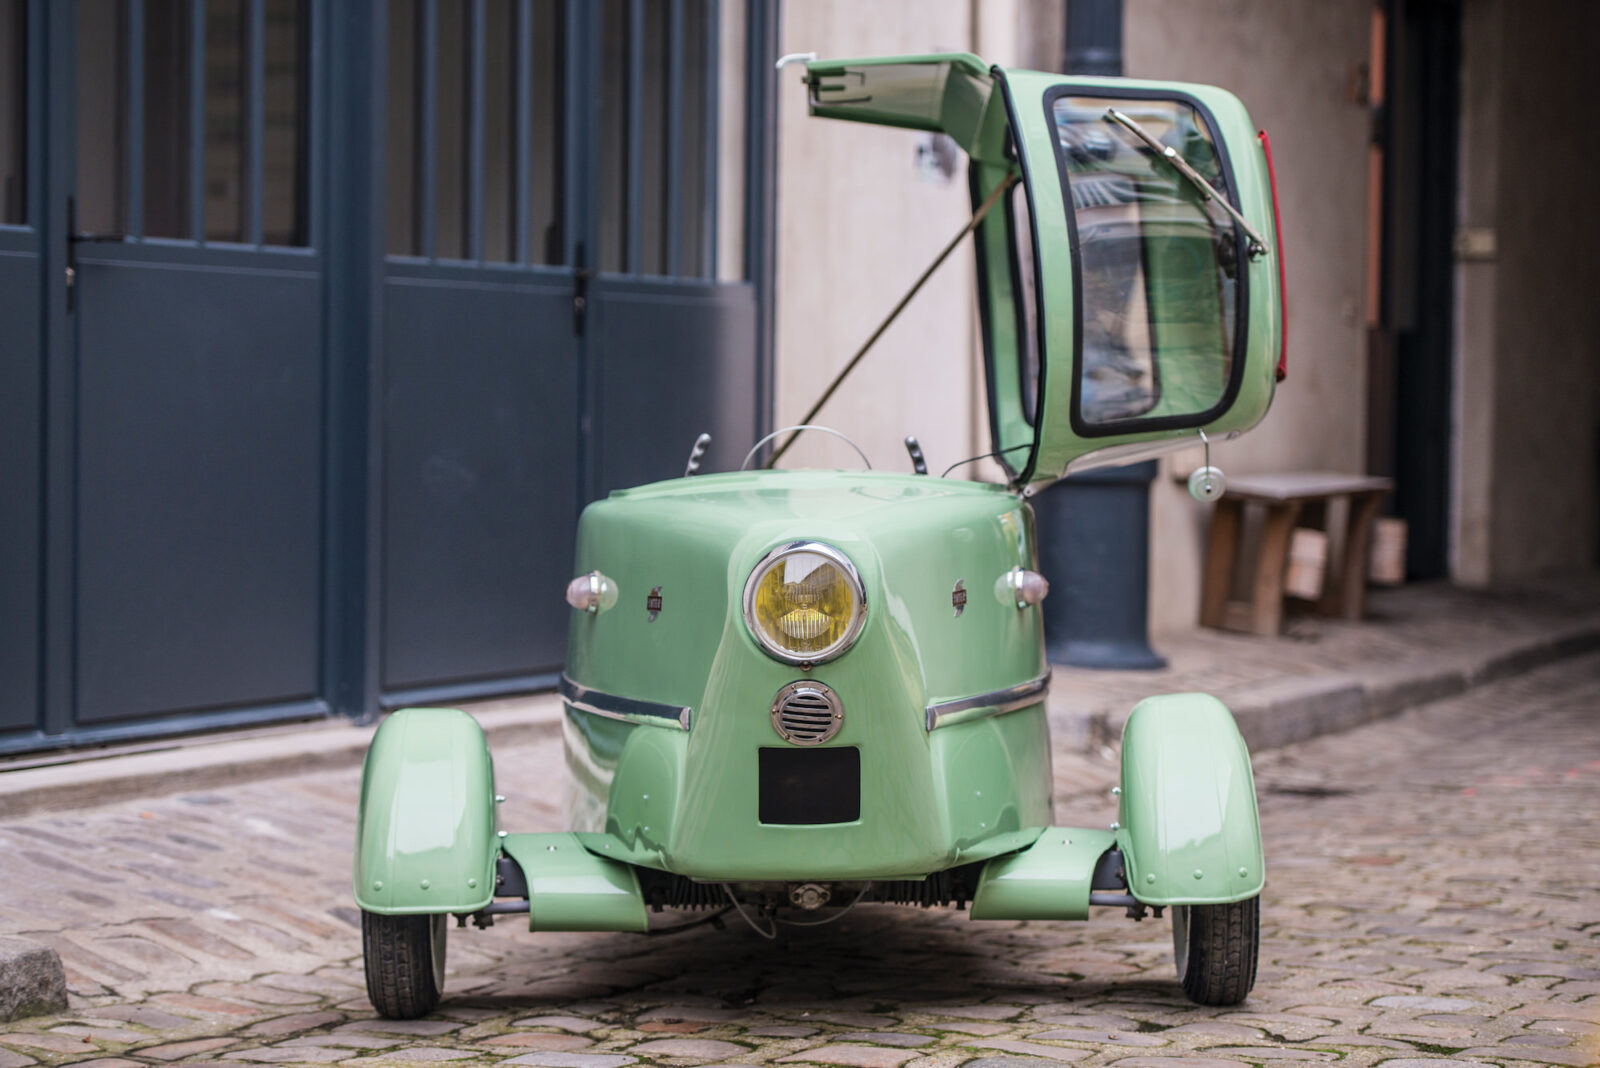 Inter 175A Berline Microcar 9 1600x1068 - 1956 Inter 175A Berline Microcar